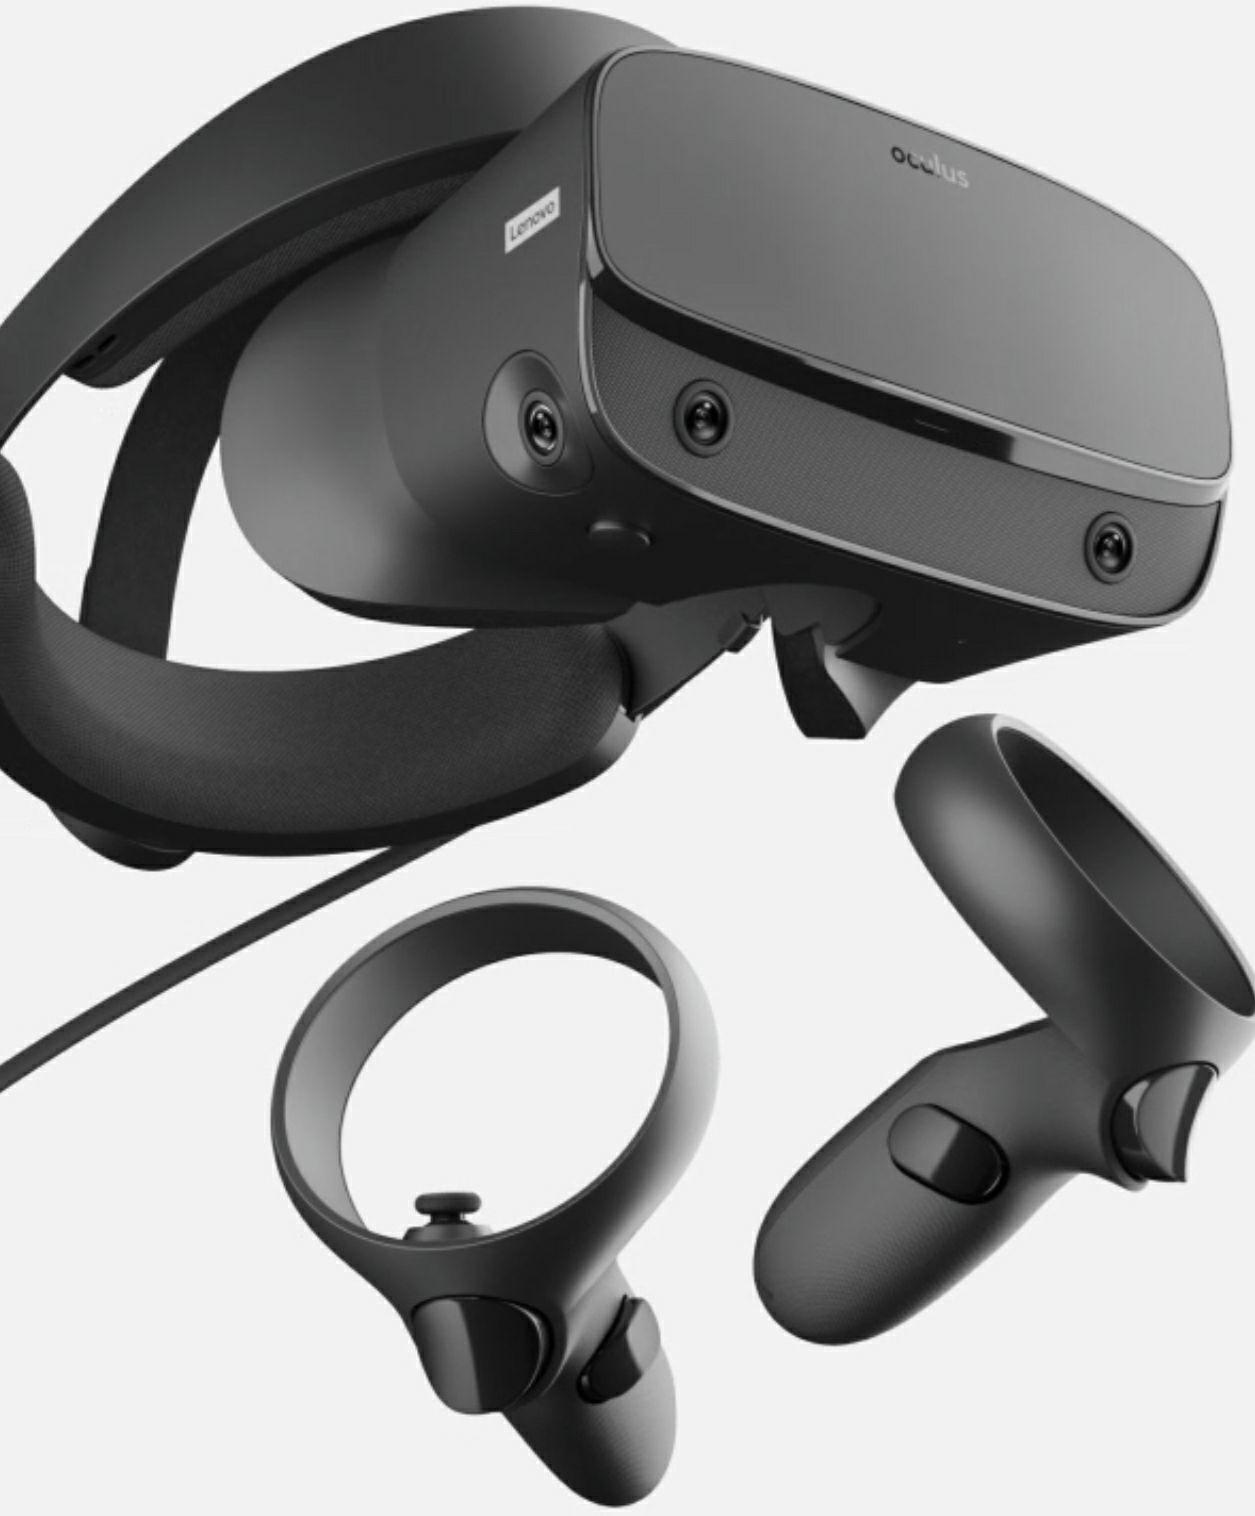 Oculus Rift S VR Headset £399 at Oculus